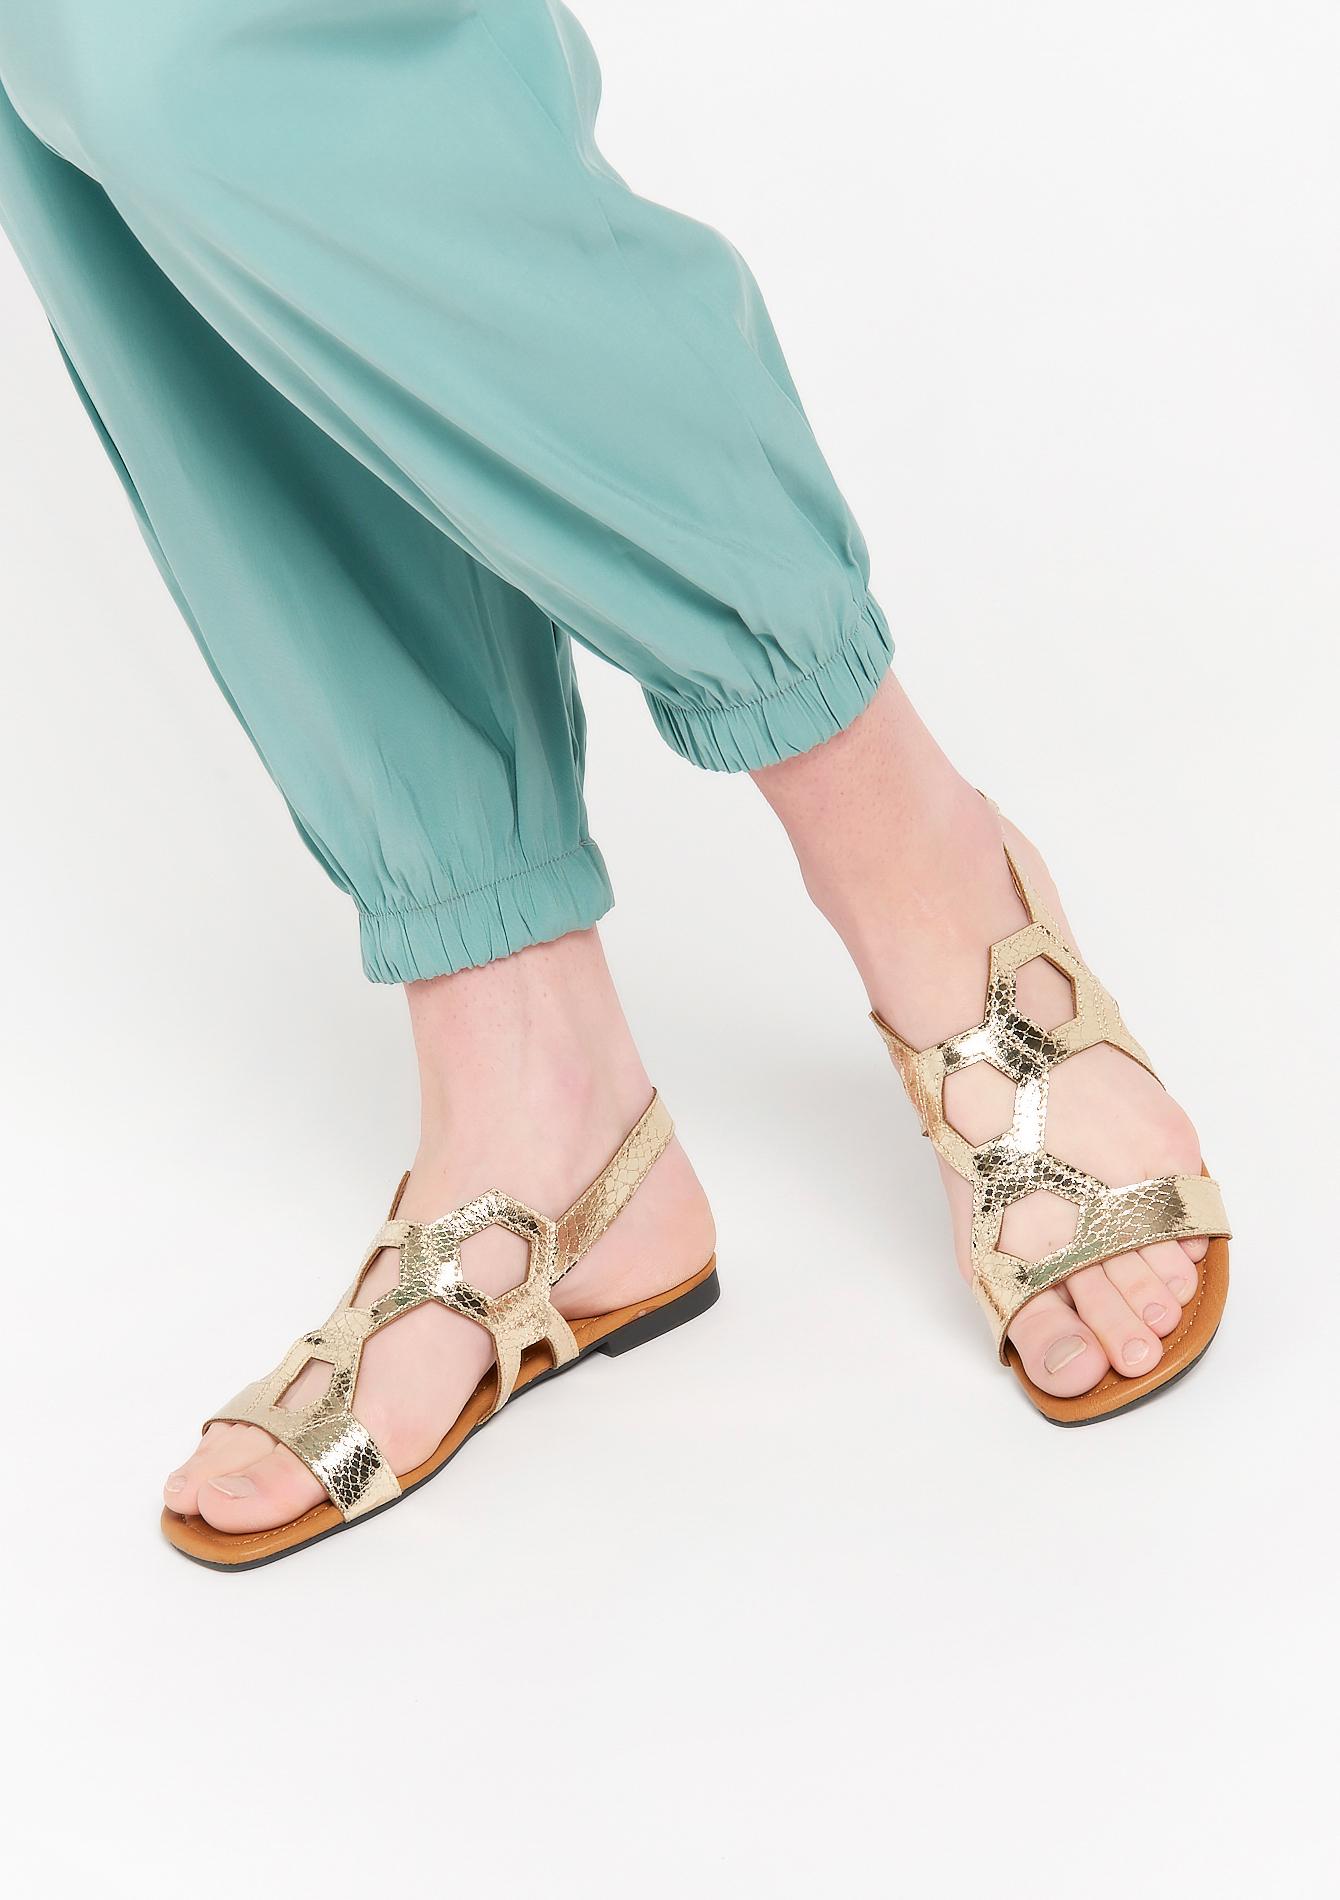 Sandales plates - LolaLiza - Modalova